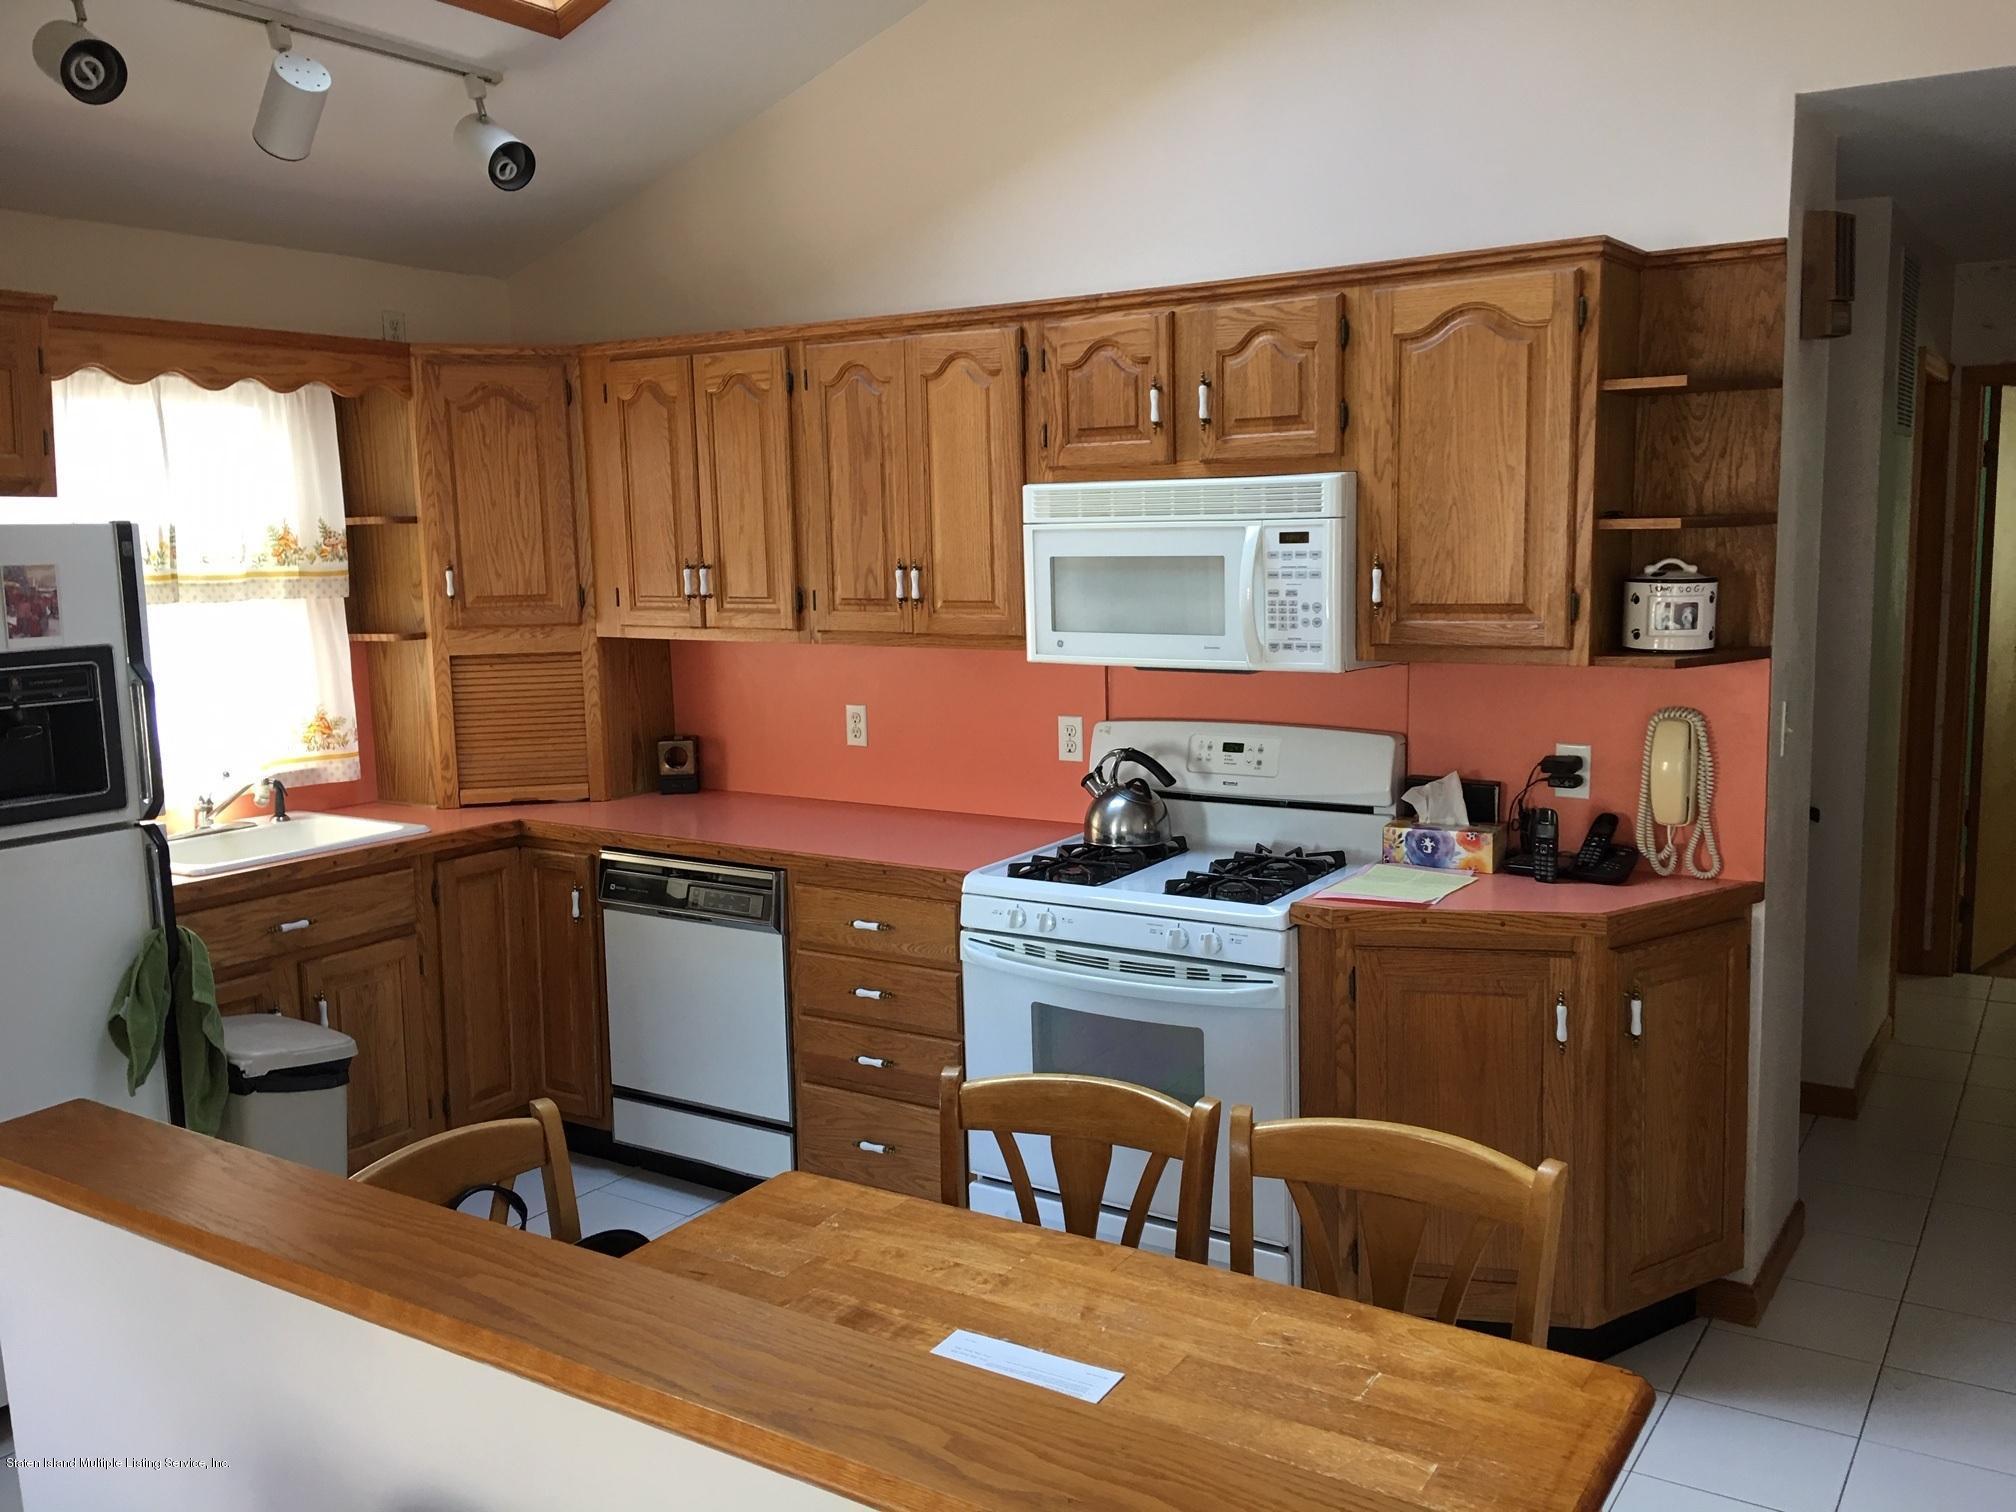 Single Family - Detached 168 Wolverine Avenue  Staten Island, NY 10306, MLS-1127033-18